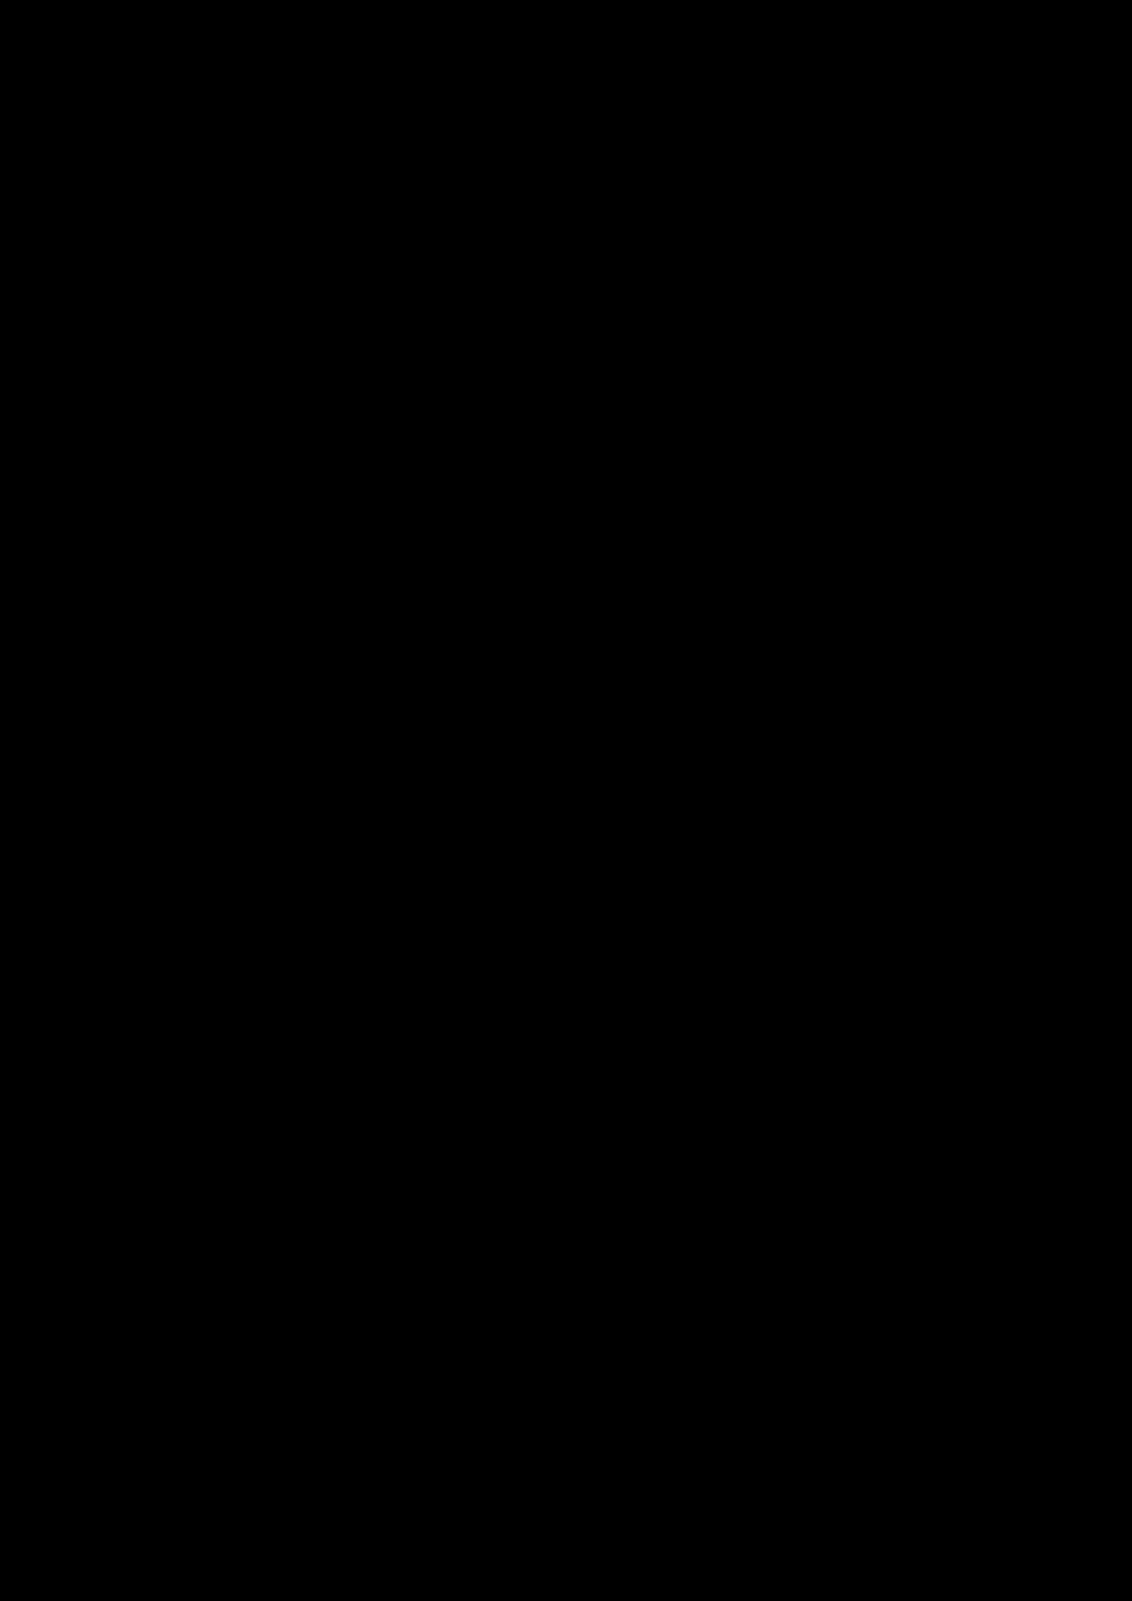 Prosti slide, Image 20